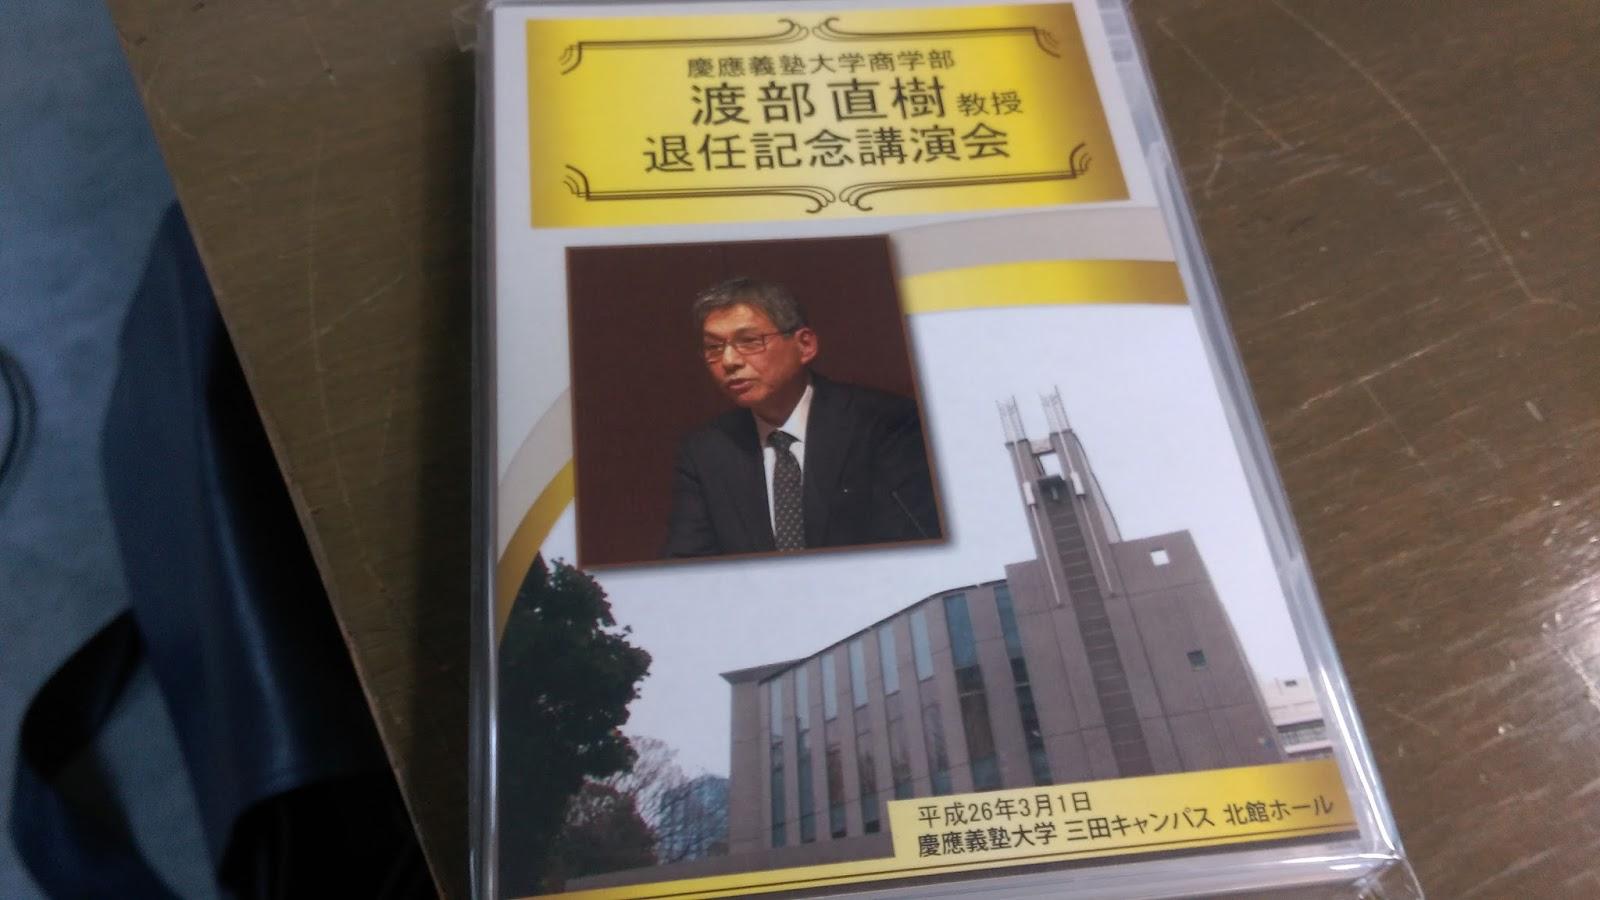 赤尾充哉 研究室便り: 慶應義塾大学にて勉強会